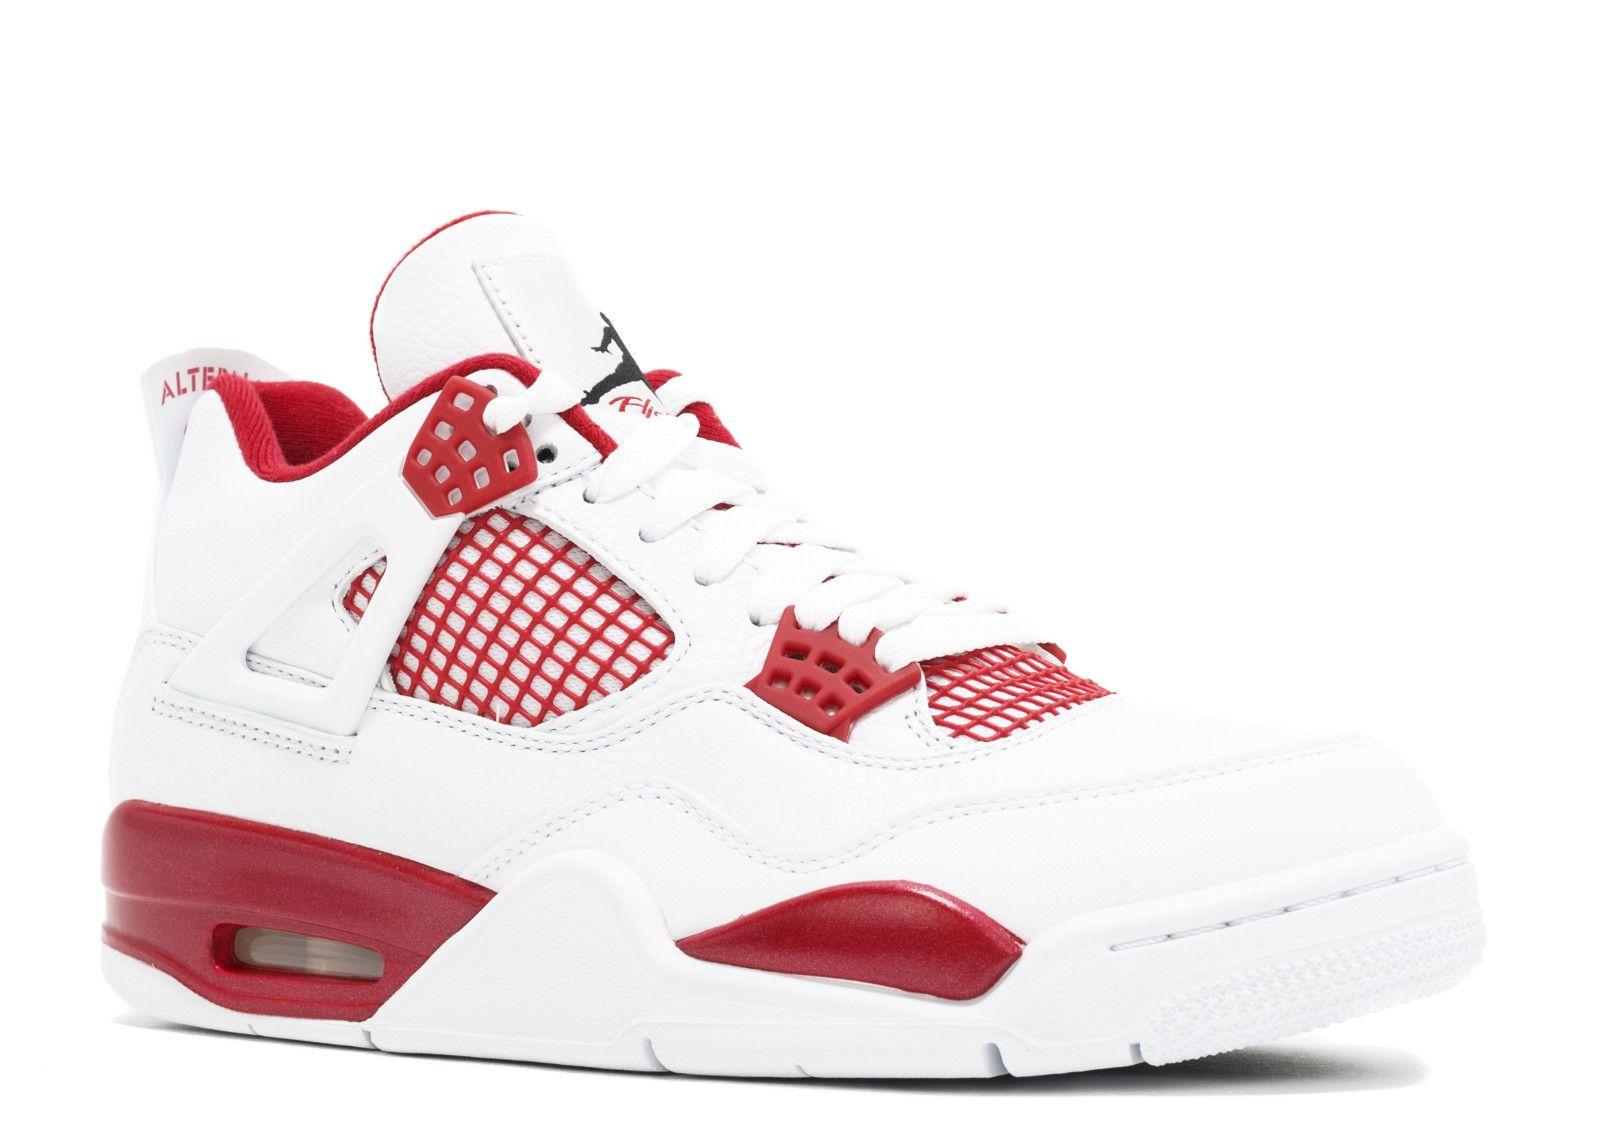 Air Jordan 4 Retro 'Alternate 89' - Air